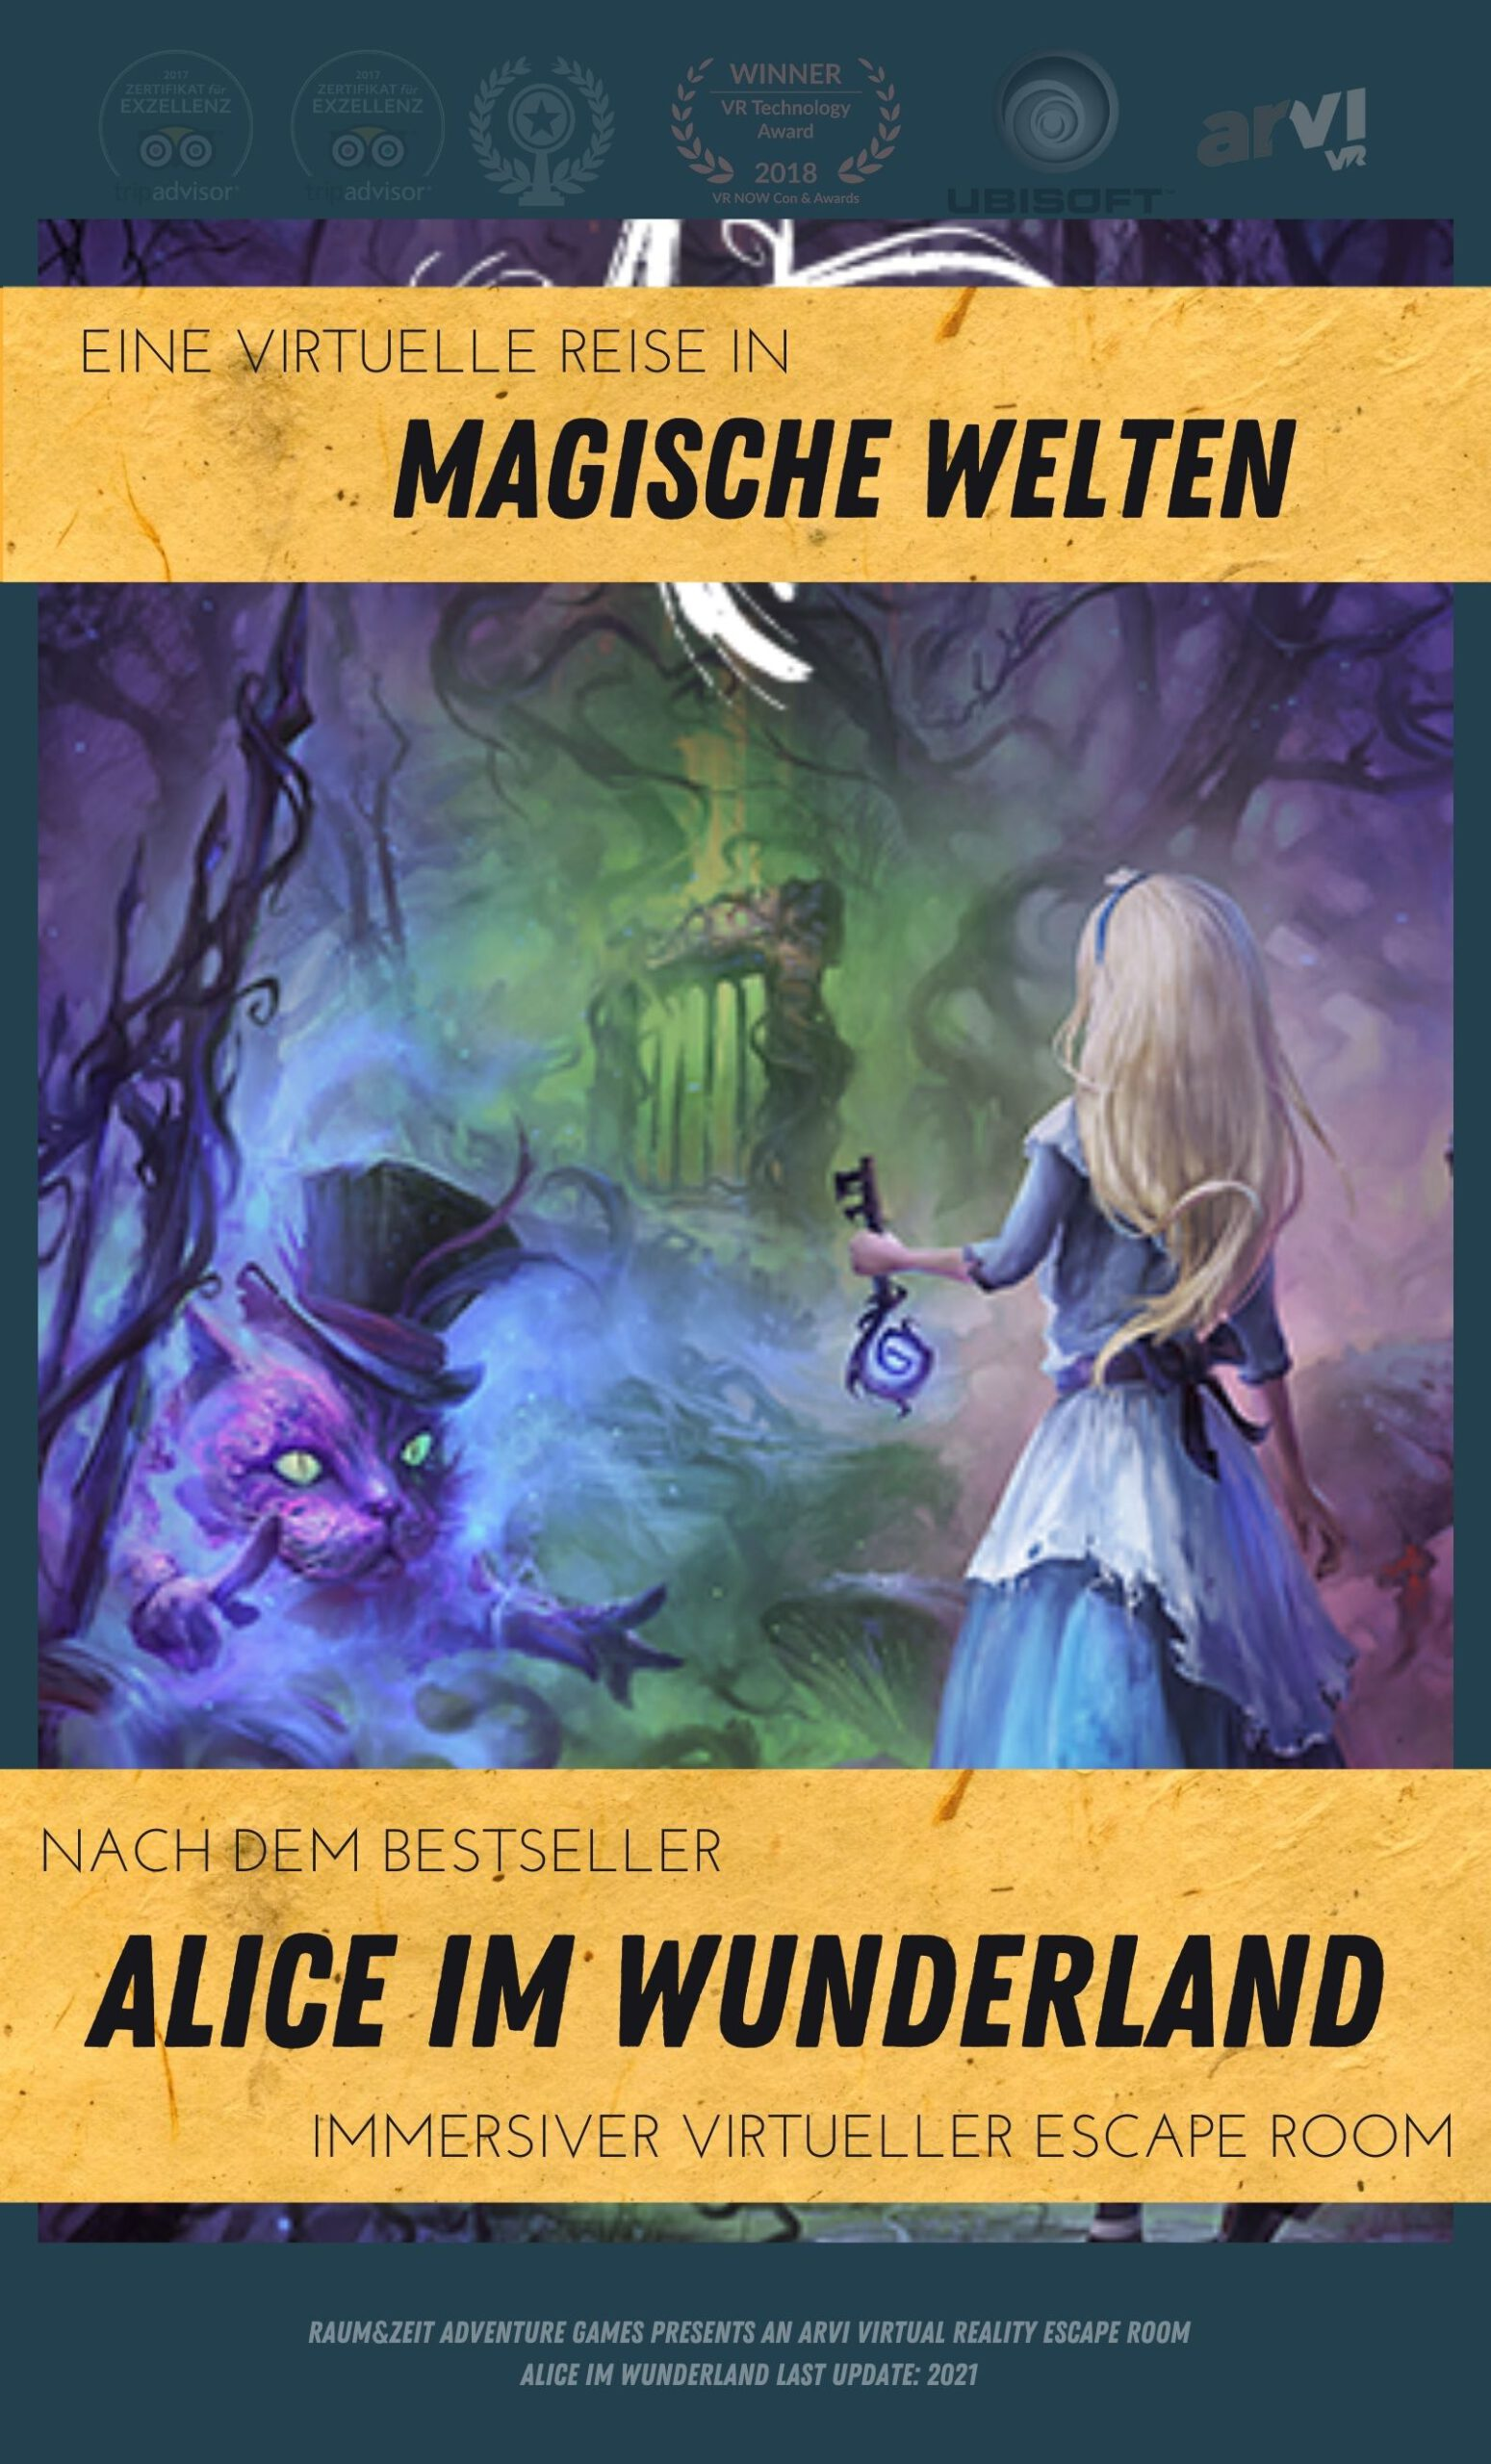 Alice-im-Wunderland-scaled.jpg